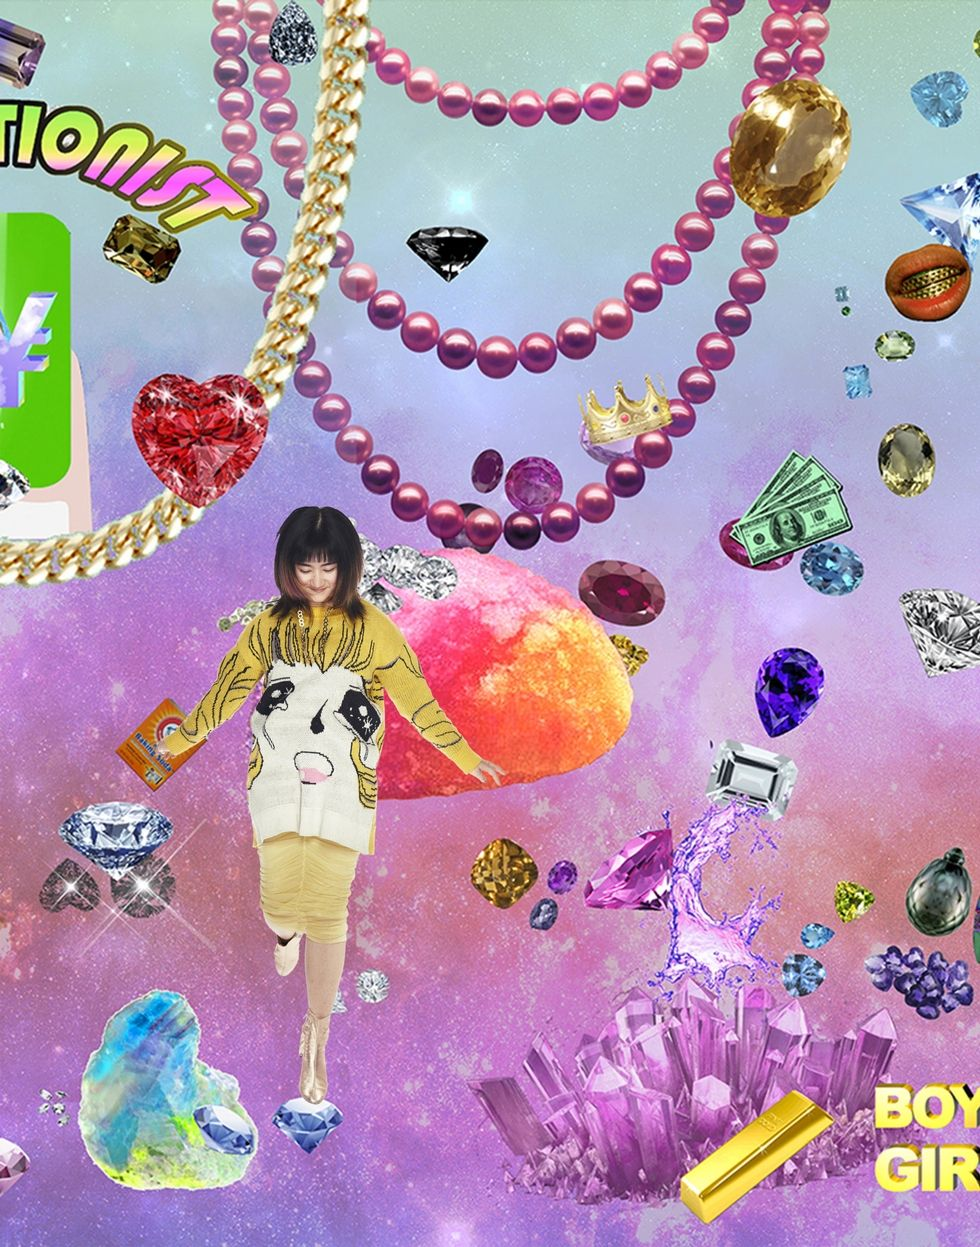 gallery-1493851703-elm050117wlmaxmara004.jpg